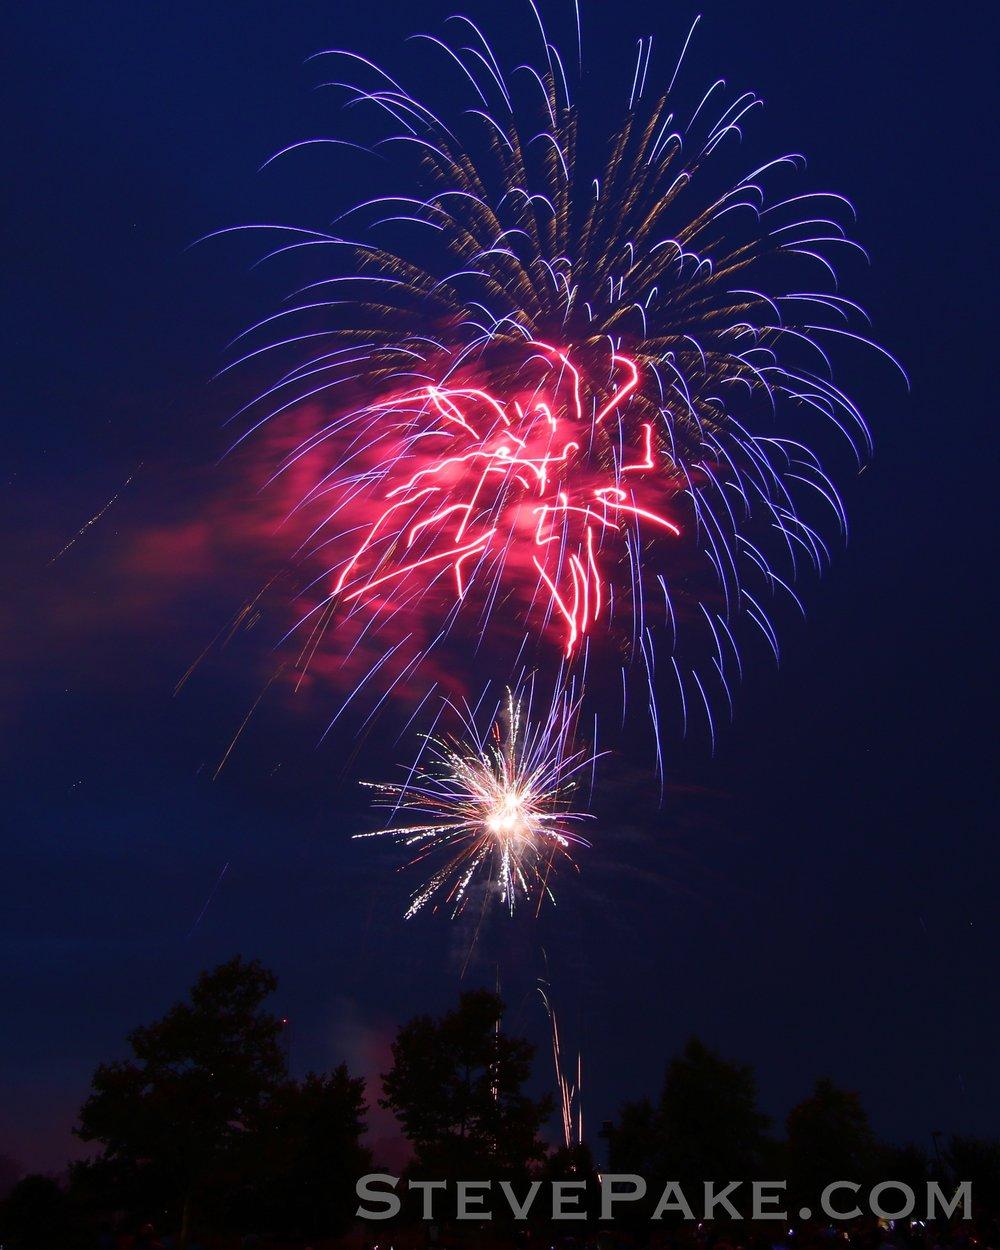 Fireworks2018_15_GE3A8520ap-HD-WM.jpg